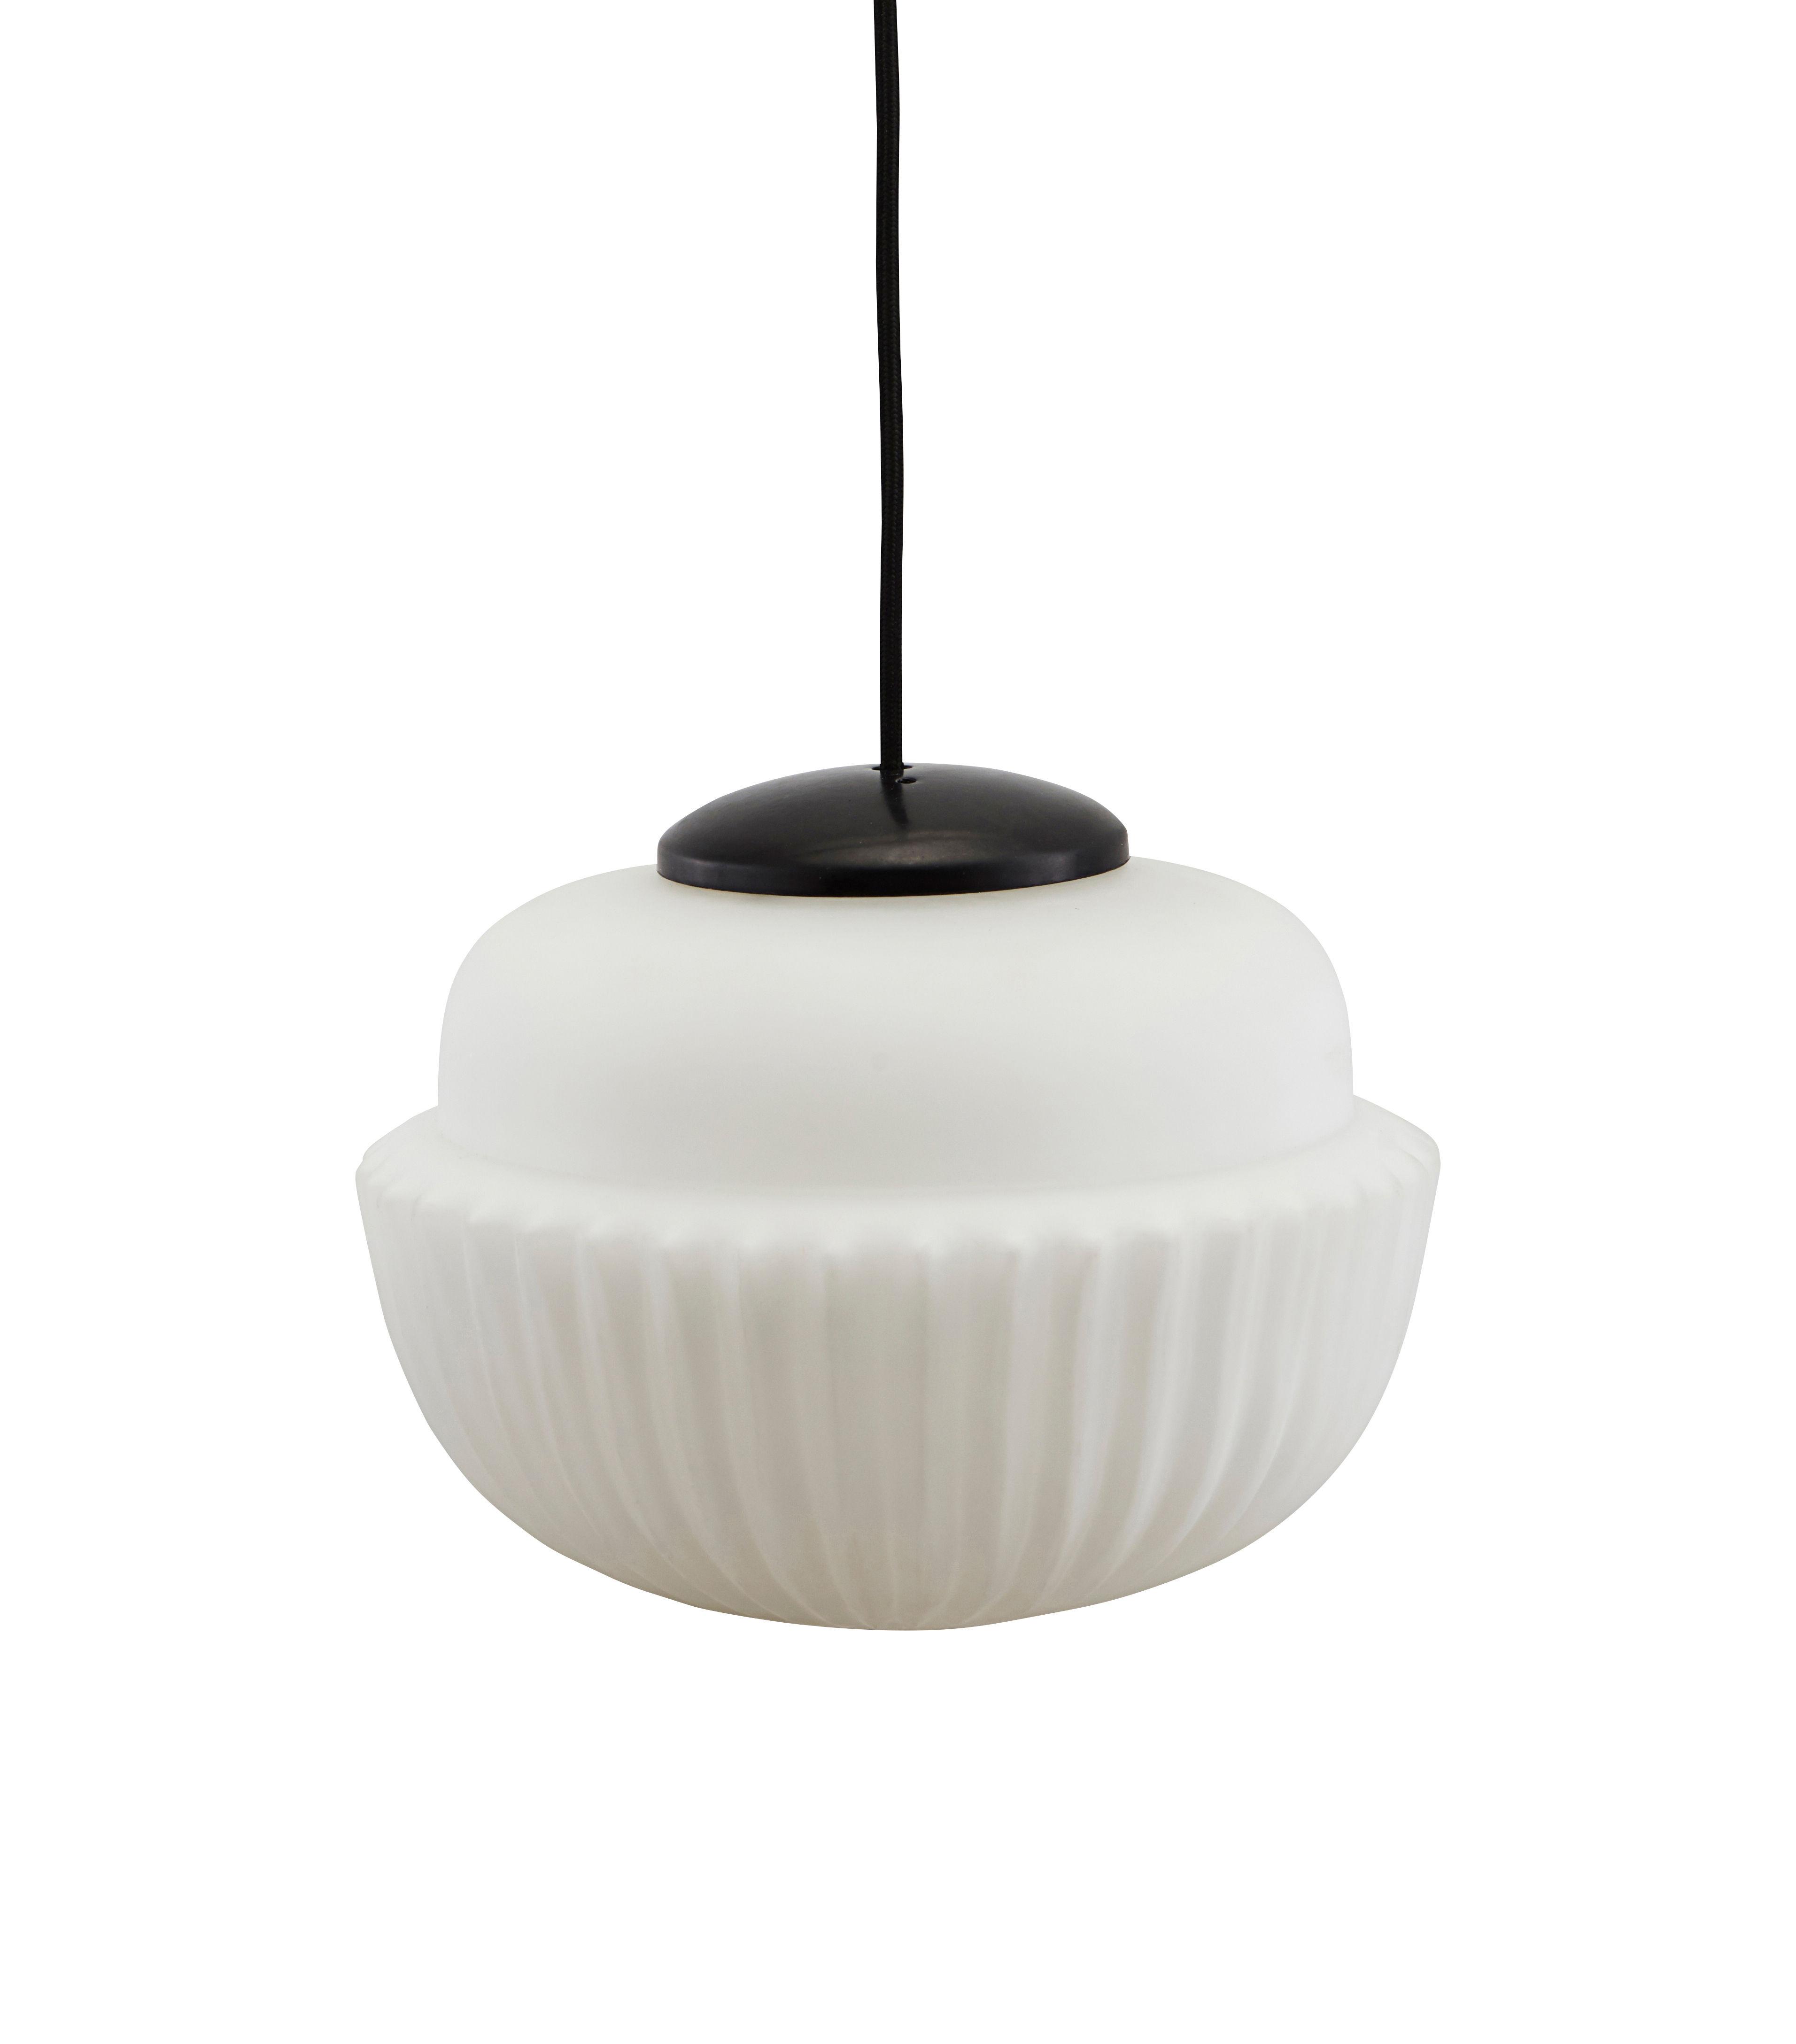 Illuminazione - Lampadari - Sospensione Acorn Large - / Vetro - Ø 29 cm di House Doctor - Ø 29 cm / Bianco - Metallo, Vetro